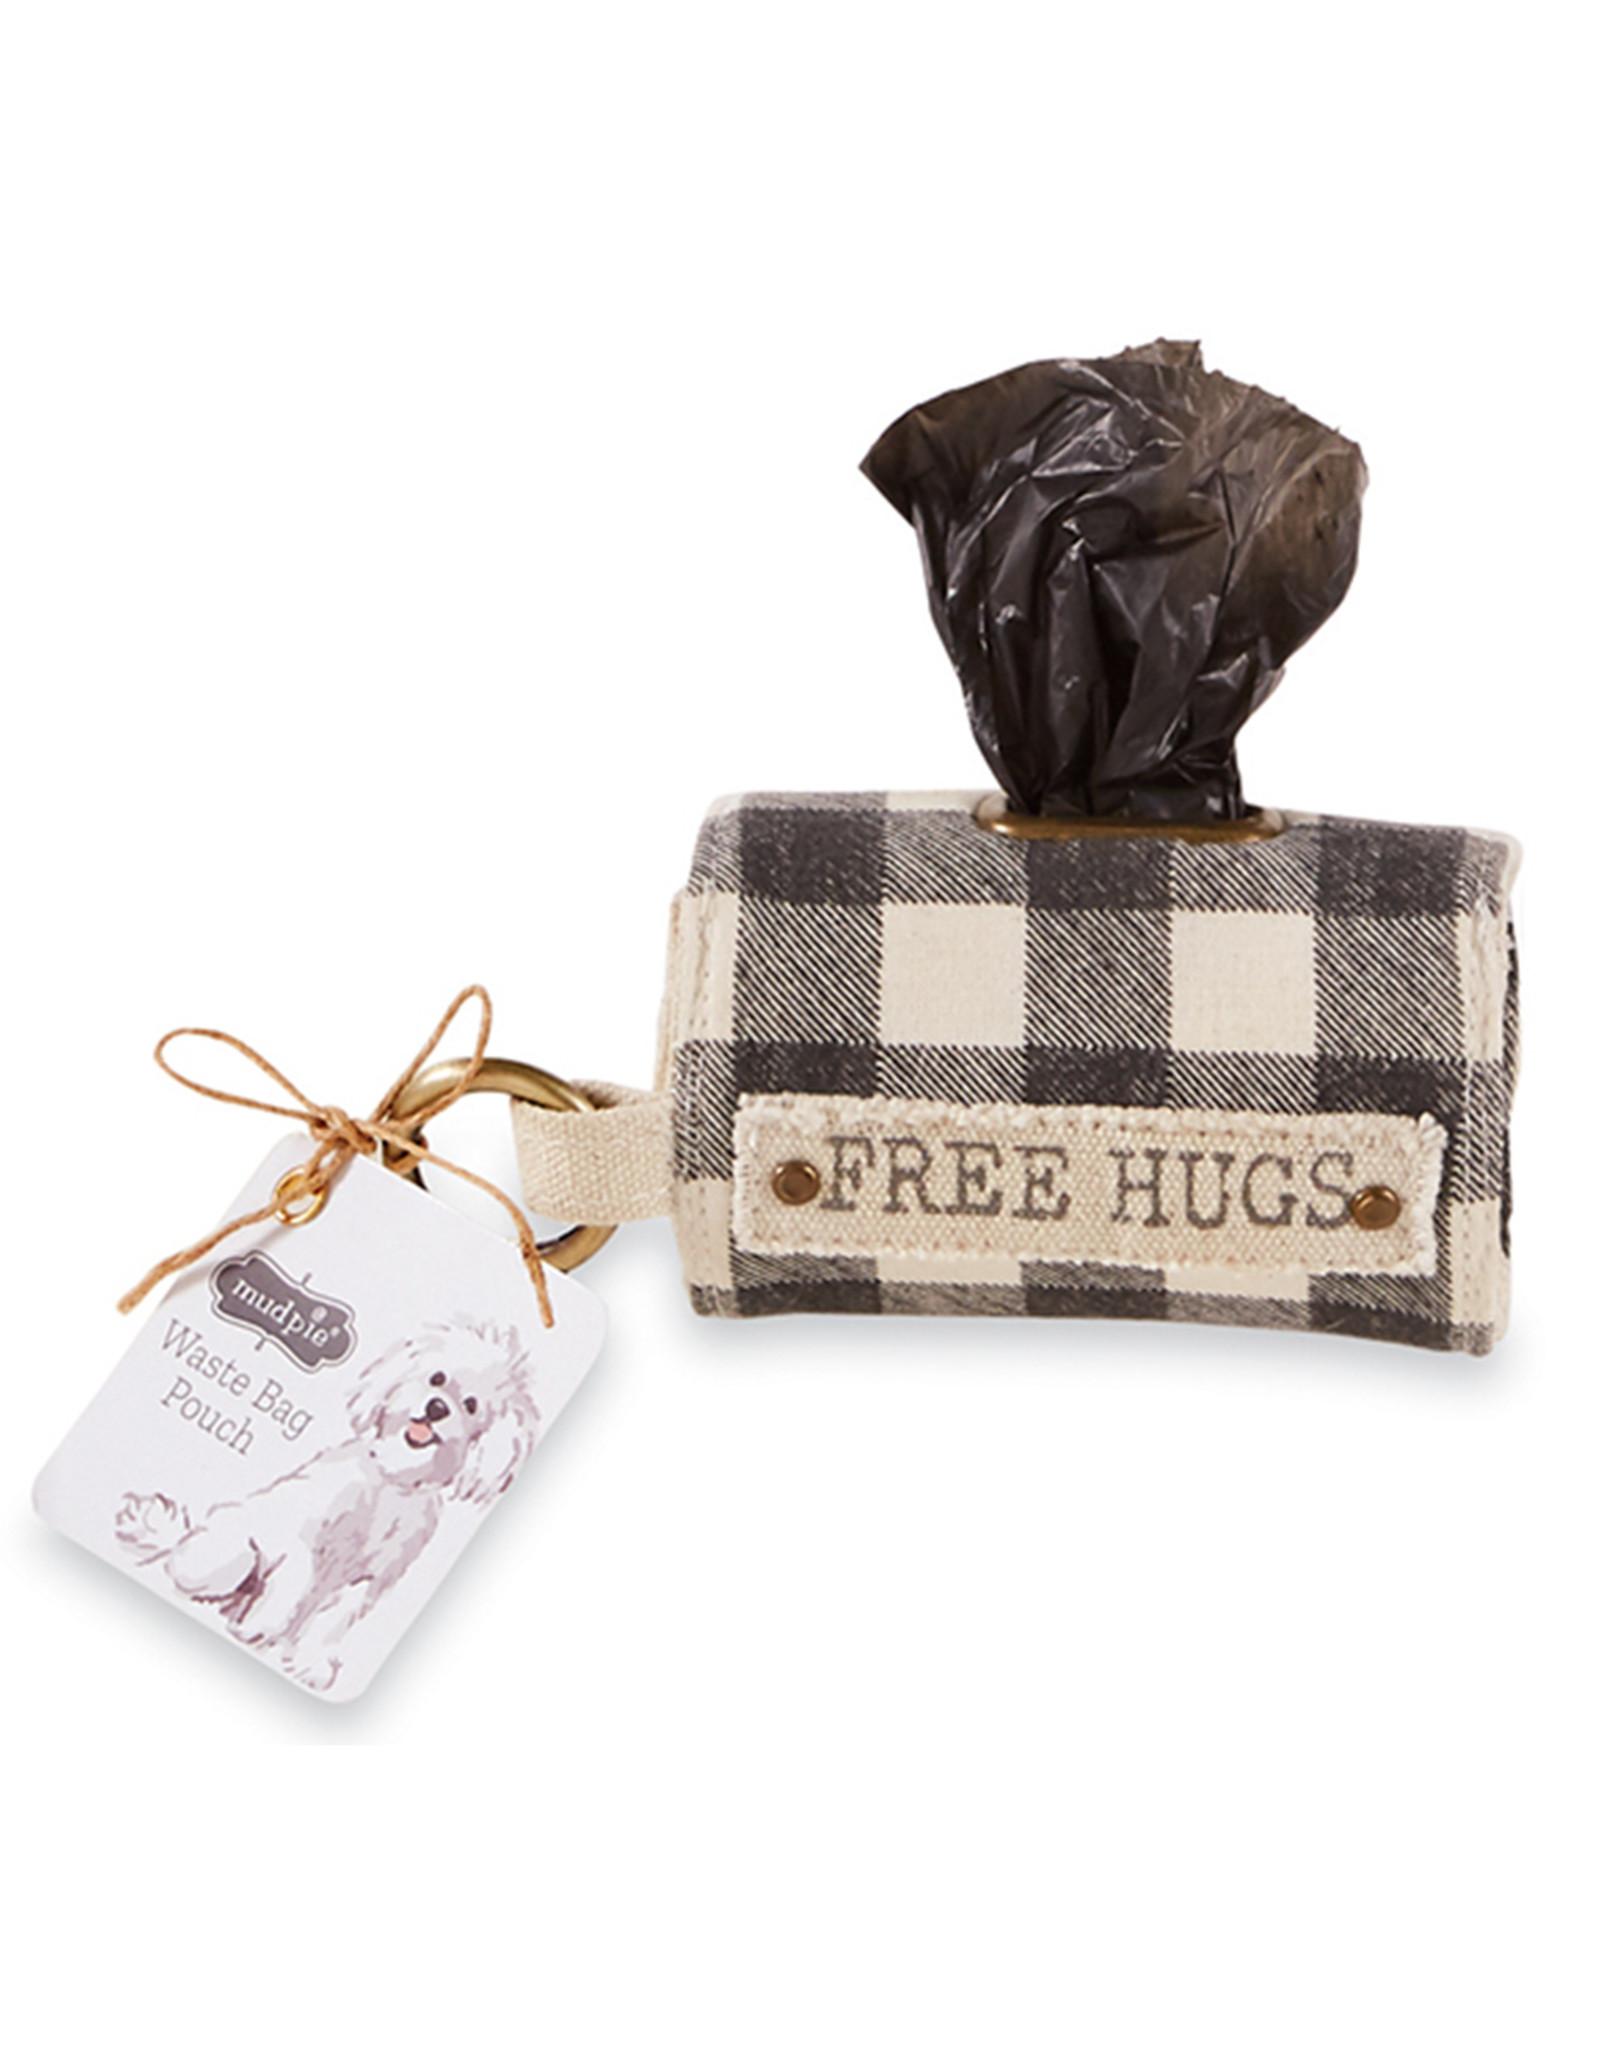 Doggie Bag Pouch, Free Hugs